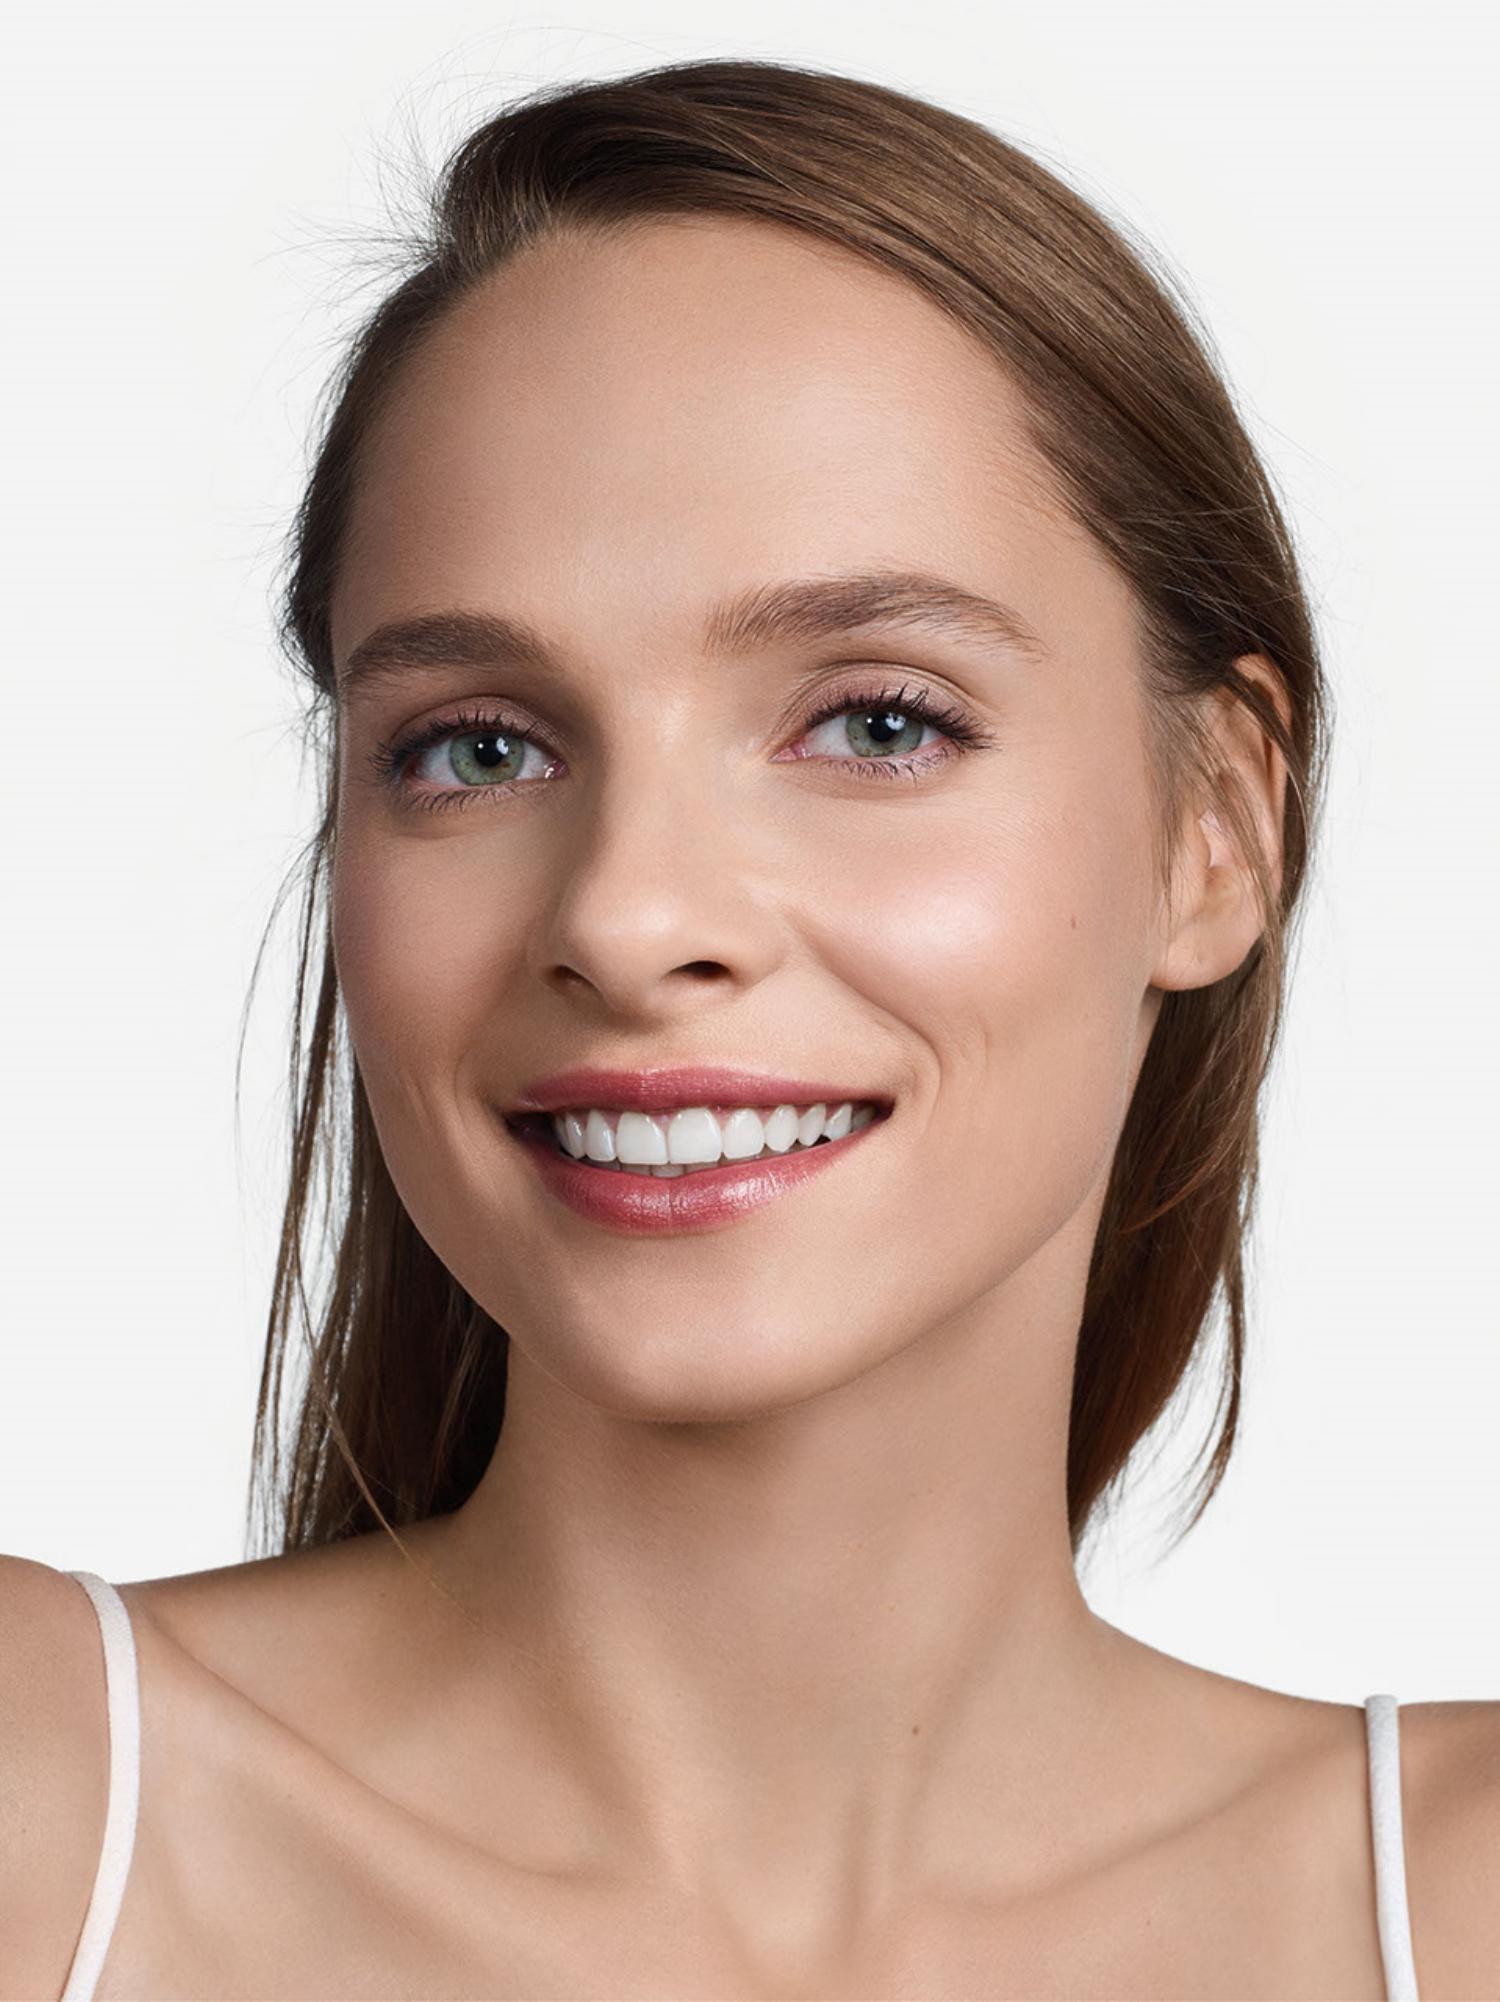 Clinique Even Better Refresh Hydratig & Repairing Makeup, cn 28 ivory